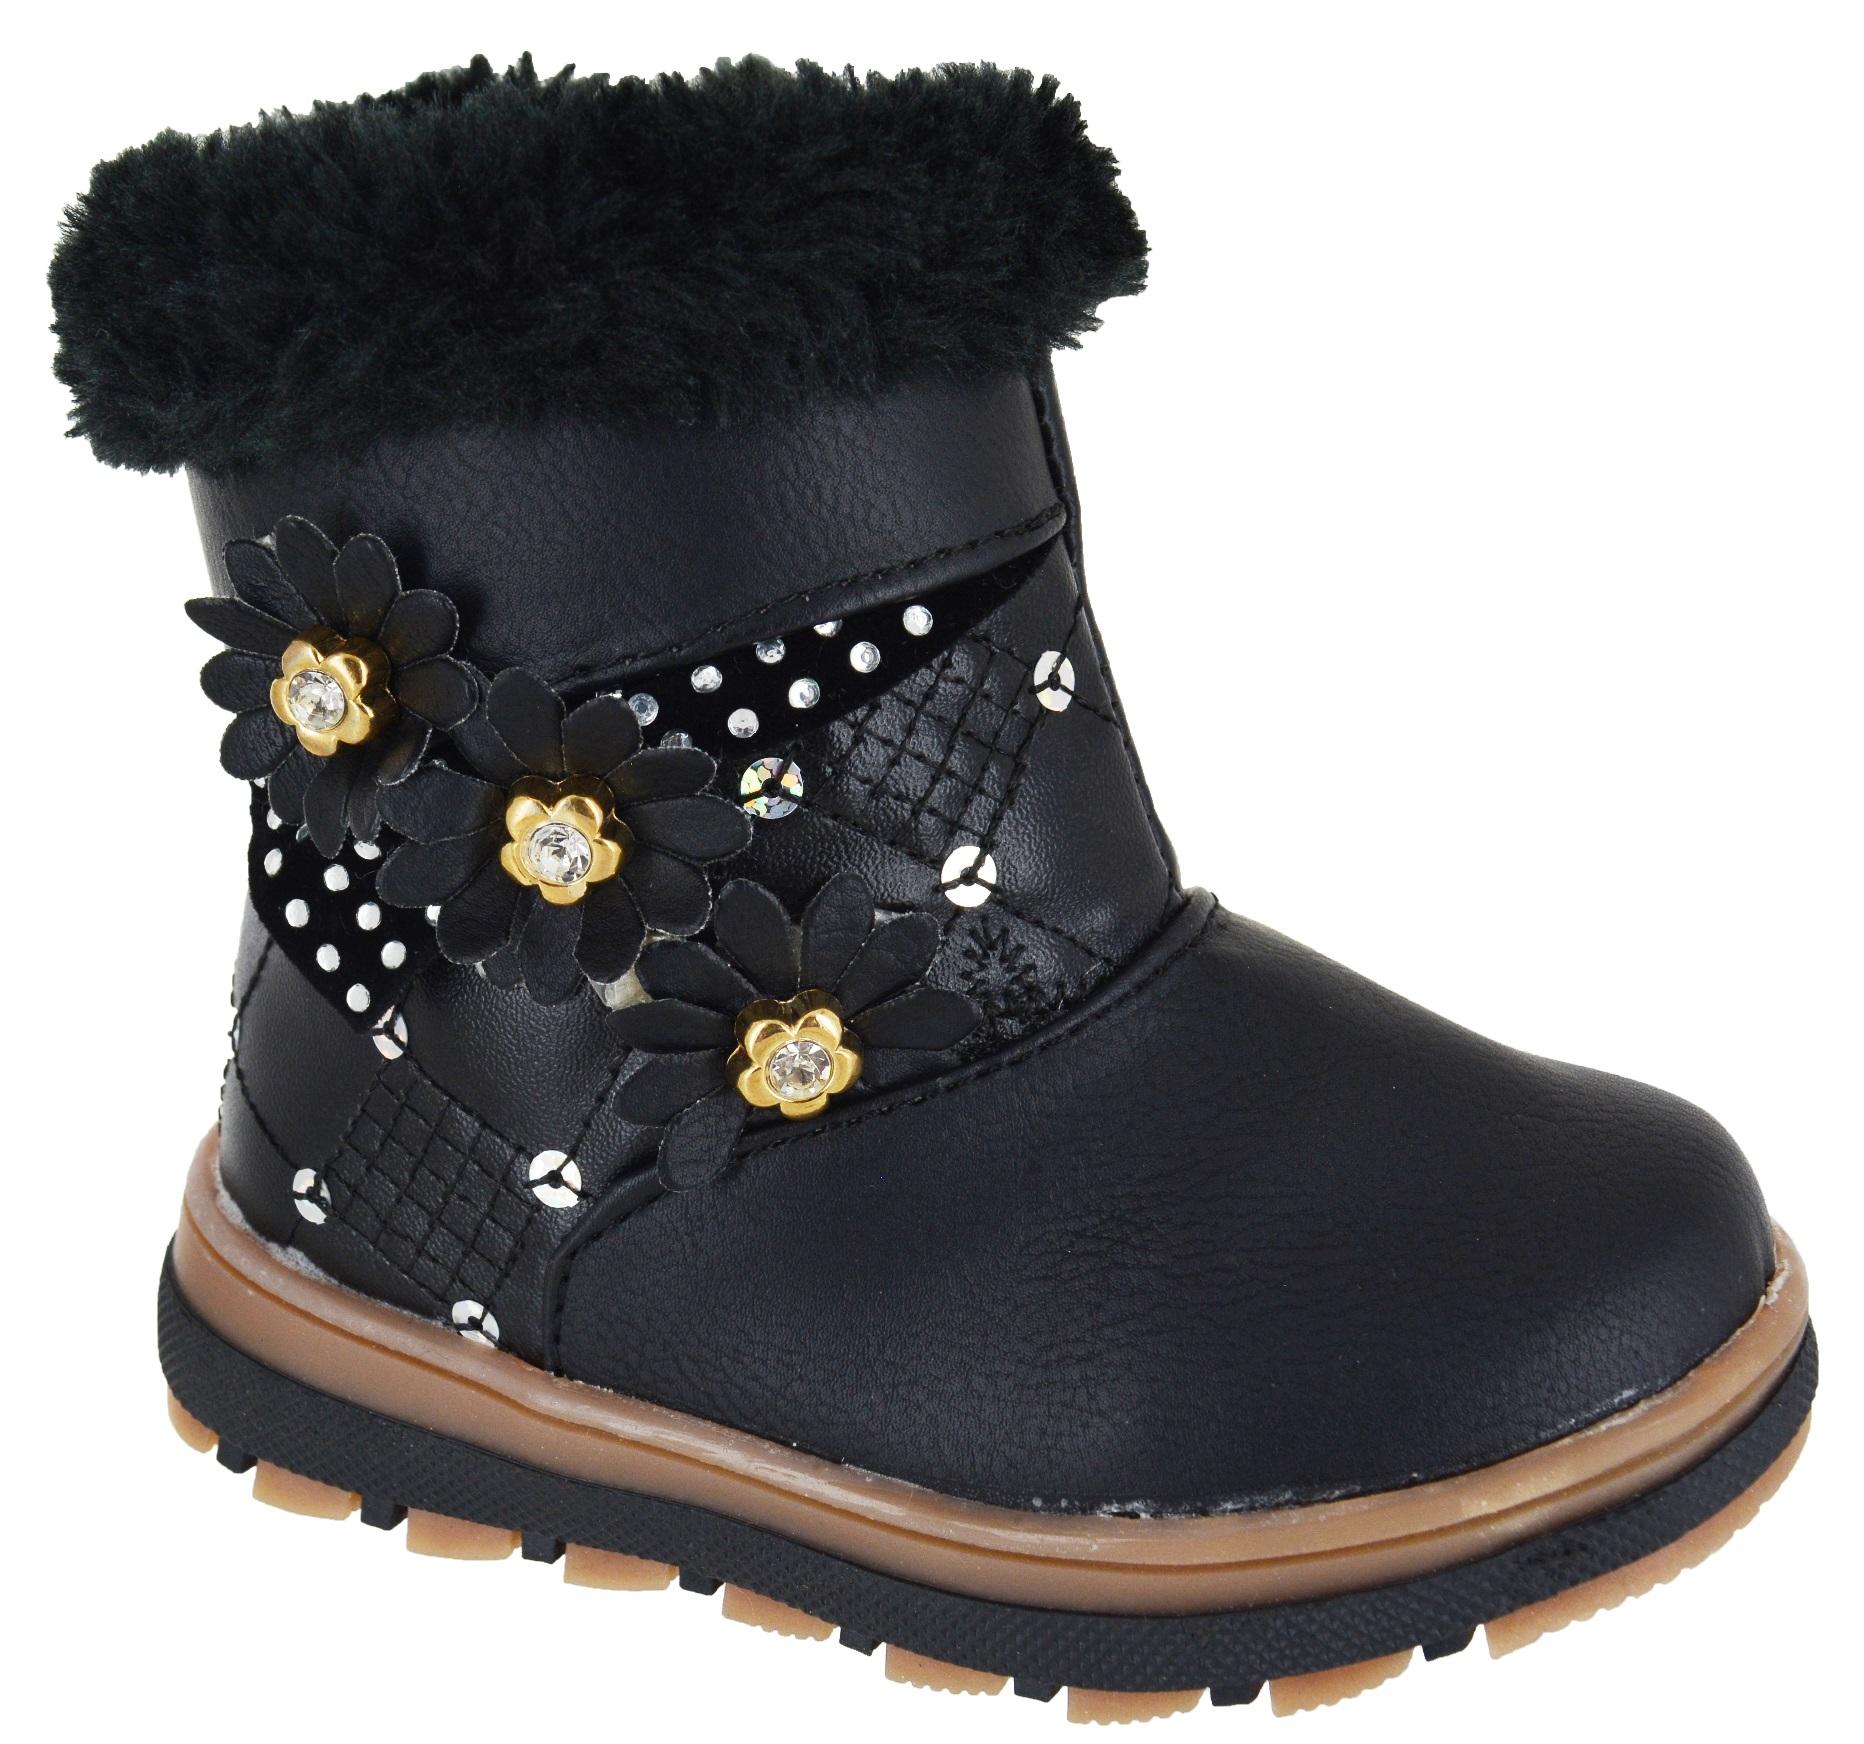 NEW-BABIES-INFANTS-CHILDREN-GIRLS-WARM-WINTER-SNOW-BOOTS-GRIP-SOLE-SHOES-SZ-3-7